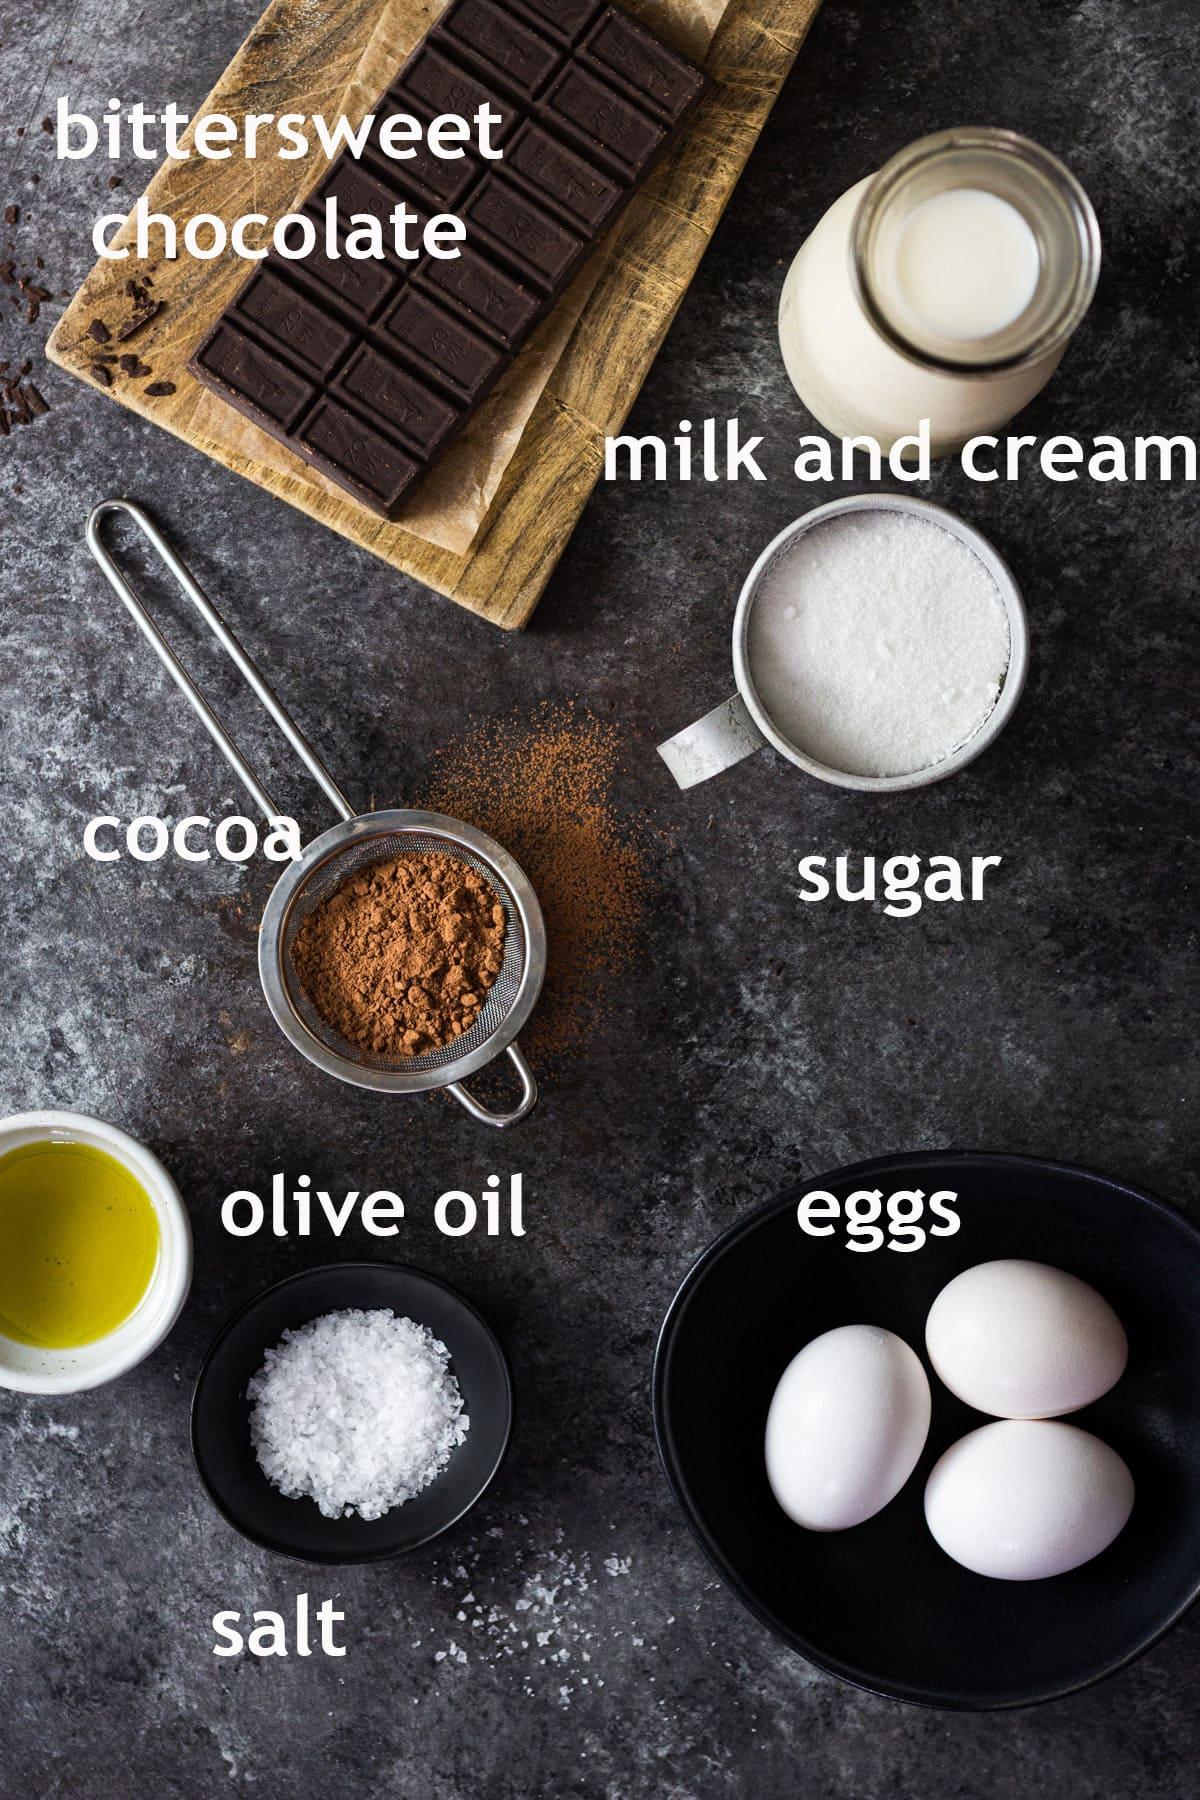 Chocolate ice cream ingredients, including chocolate, cocoa, milk, cream, sugar, olive oil, eggs and salt.